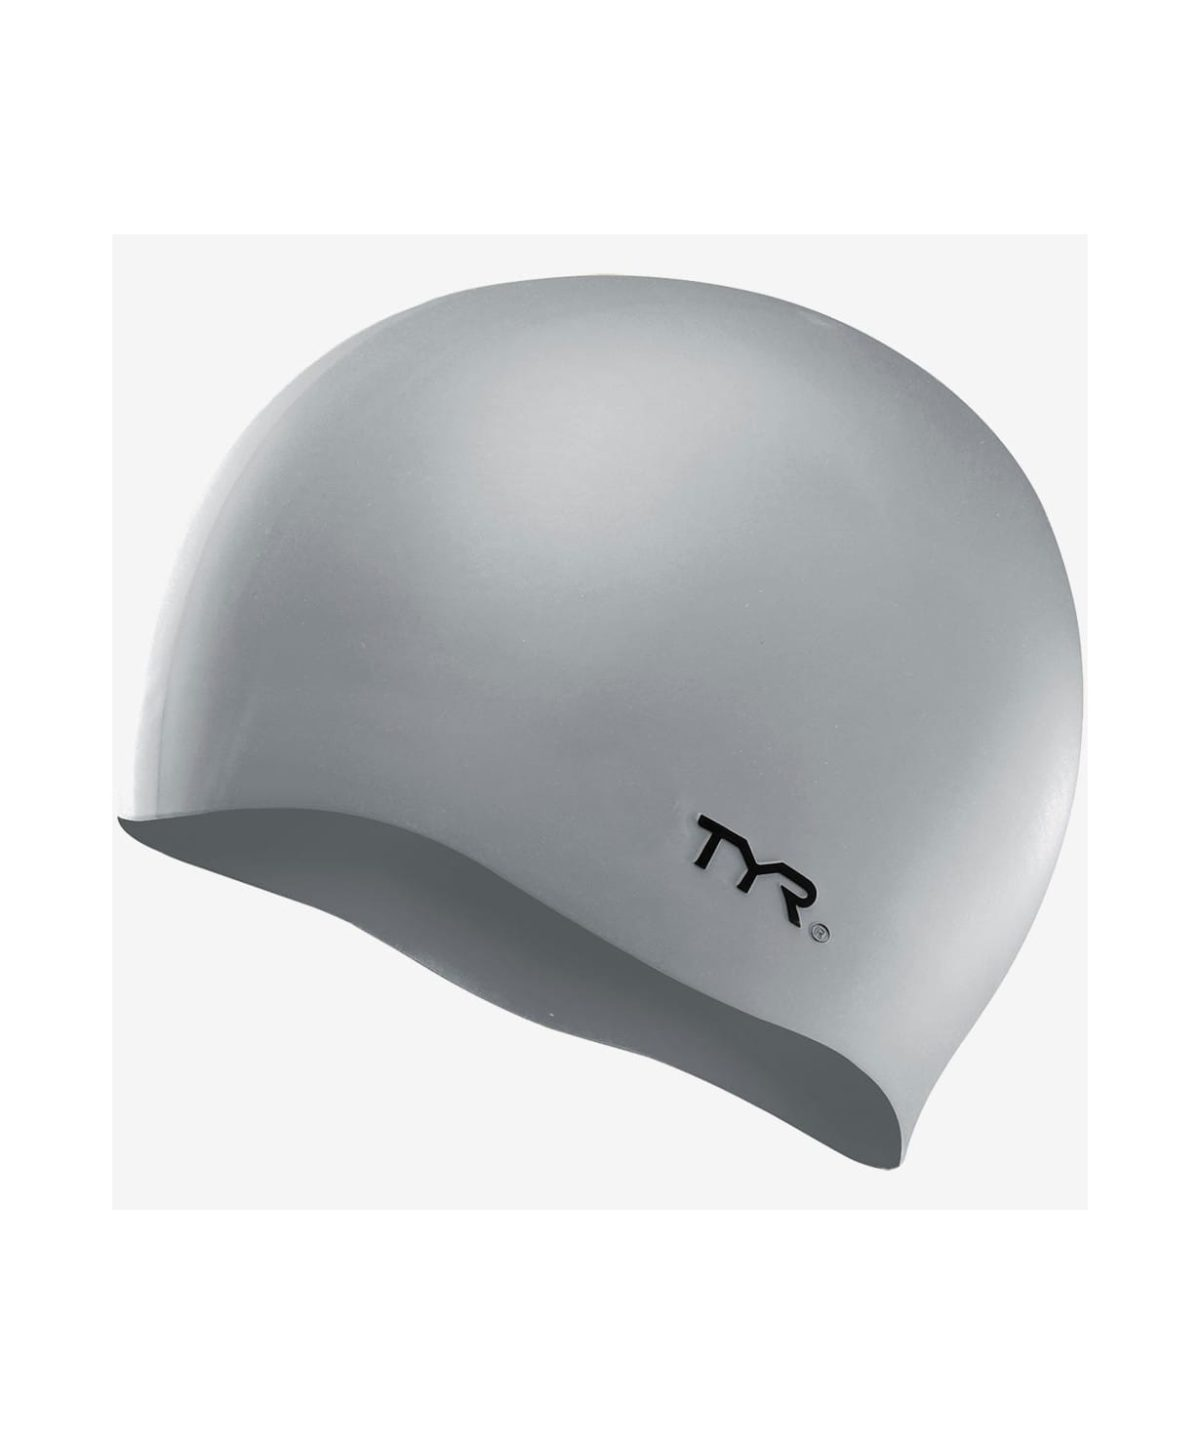 TYR Wrinkle Free Silicone Cap Шапочка для плавания силикон  LCS: серебристый - 1